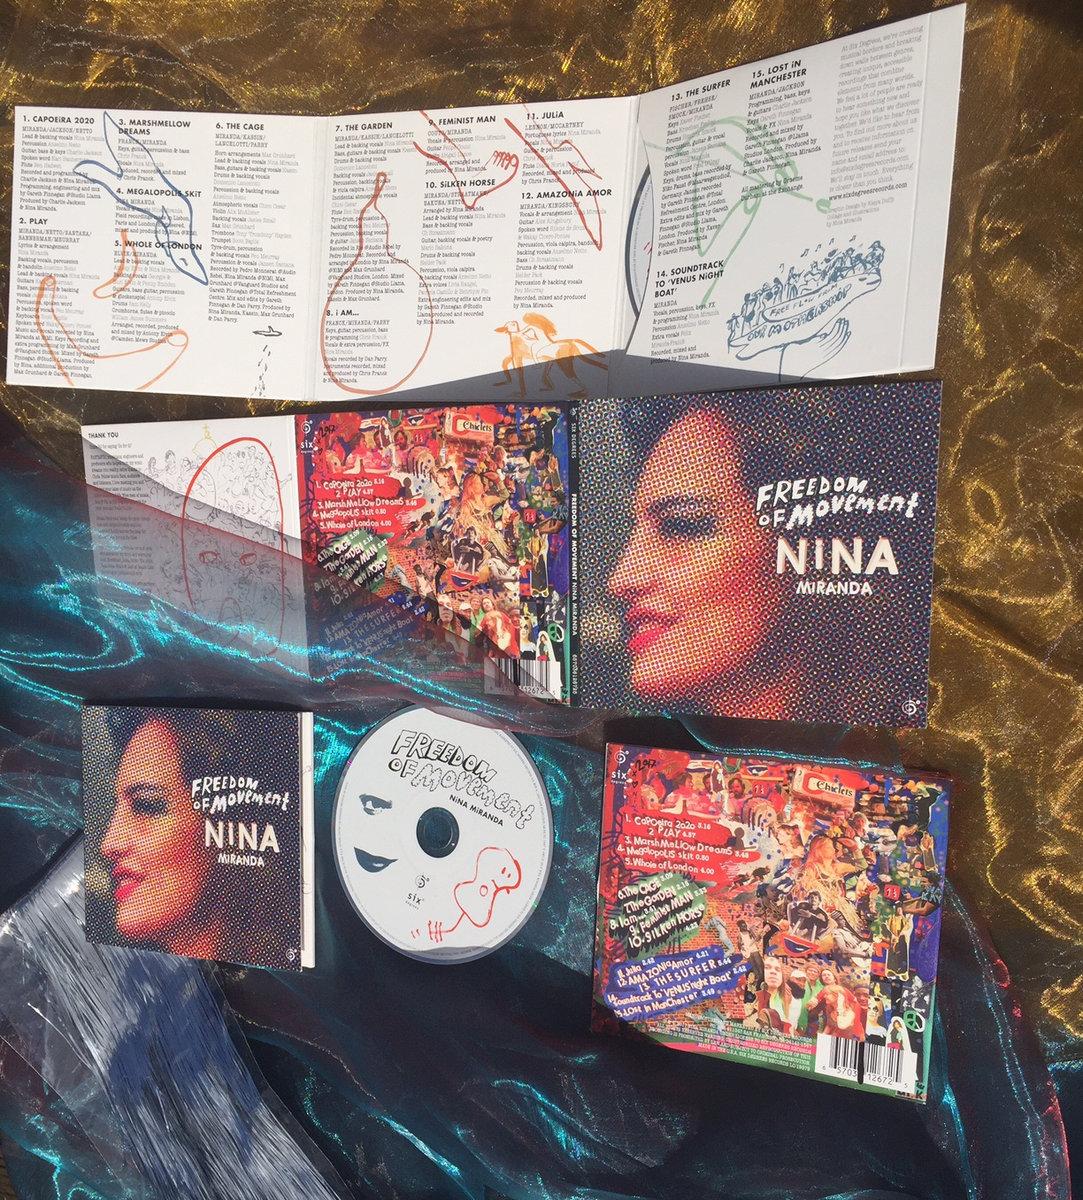 Nina Miranda: Whole of London (single) out now